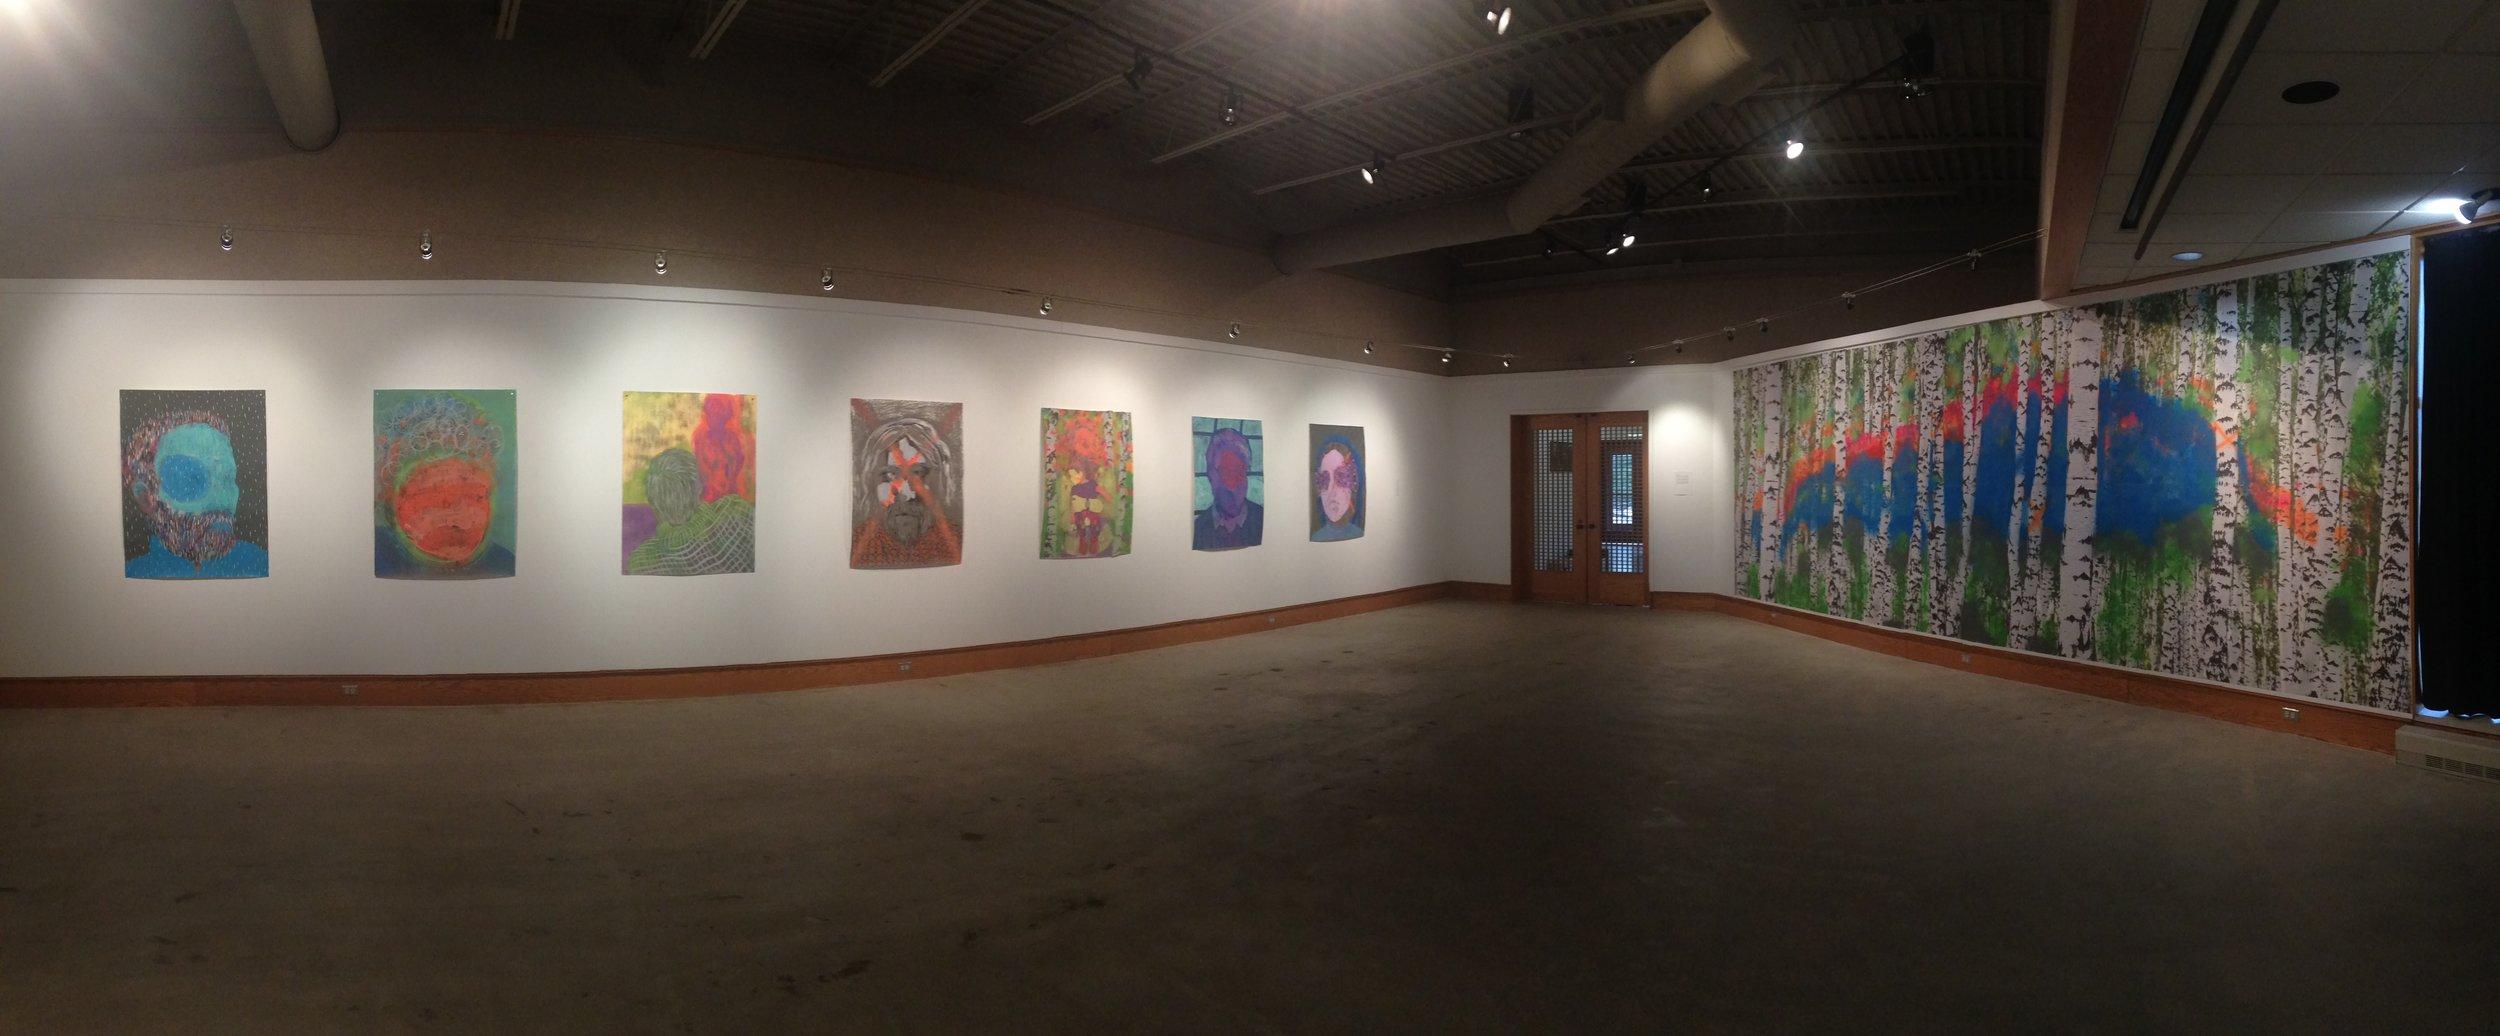 Jackie Hoving,Installation Views:Presence, Caestecker Gallery, Ripon College, WI